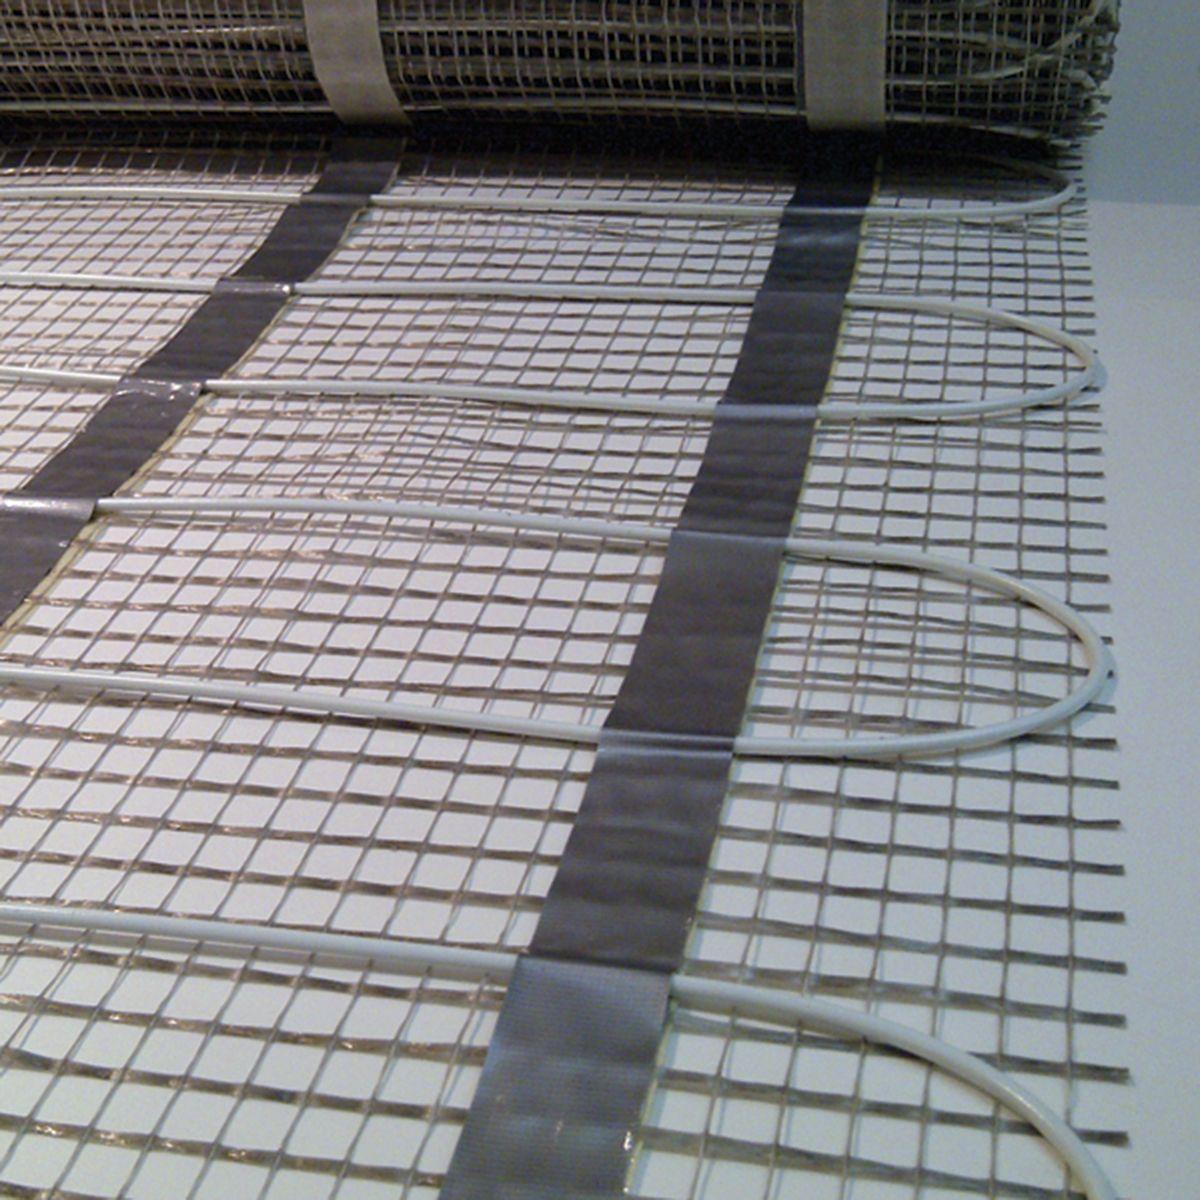 cosytoes1.5sqmetrestradematplusunderfloorheating